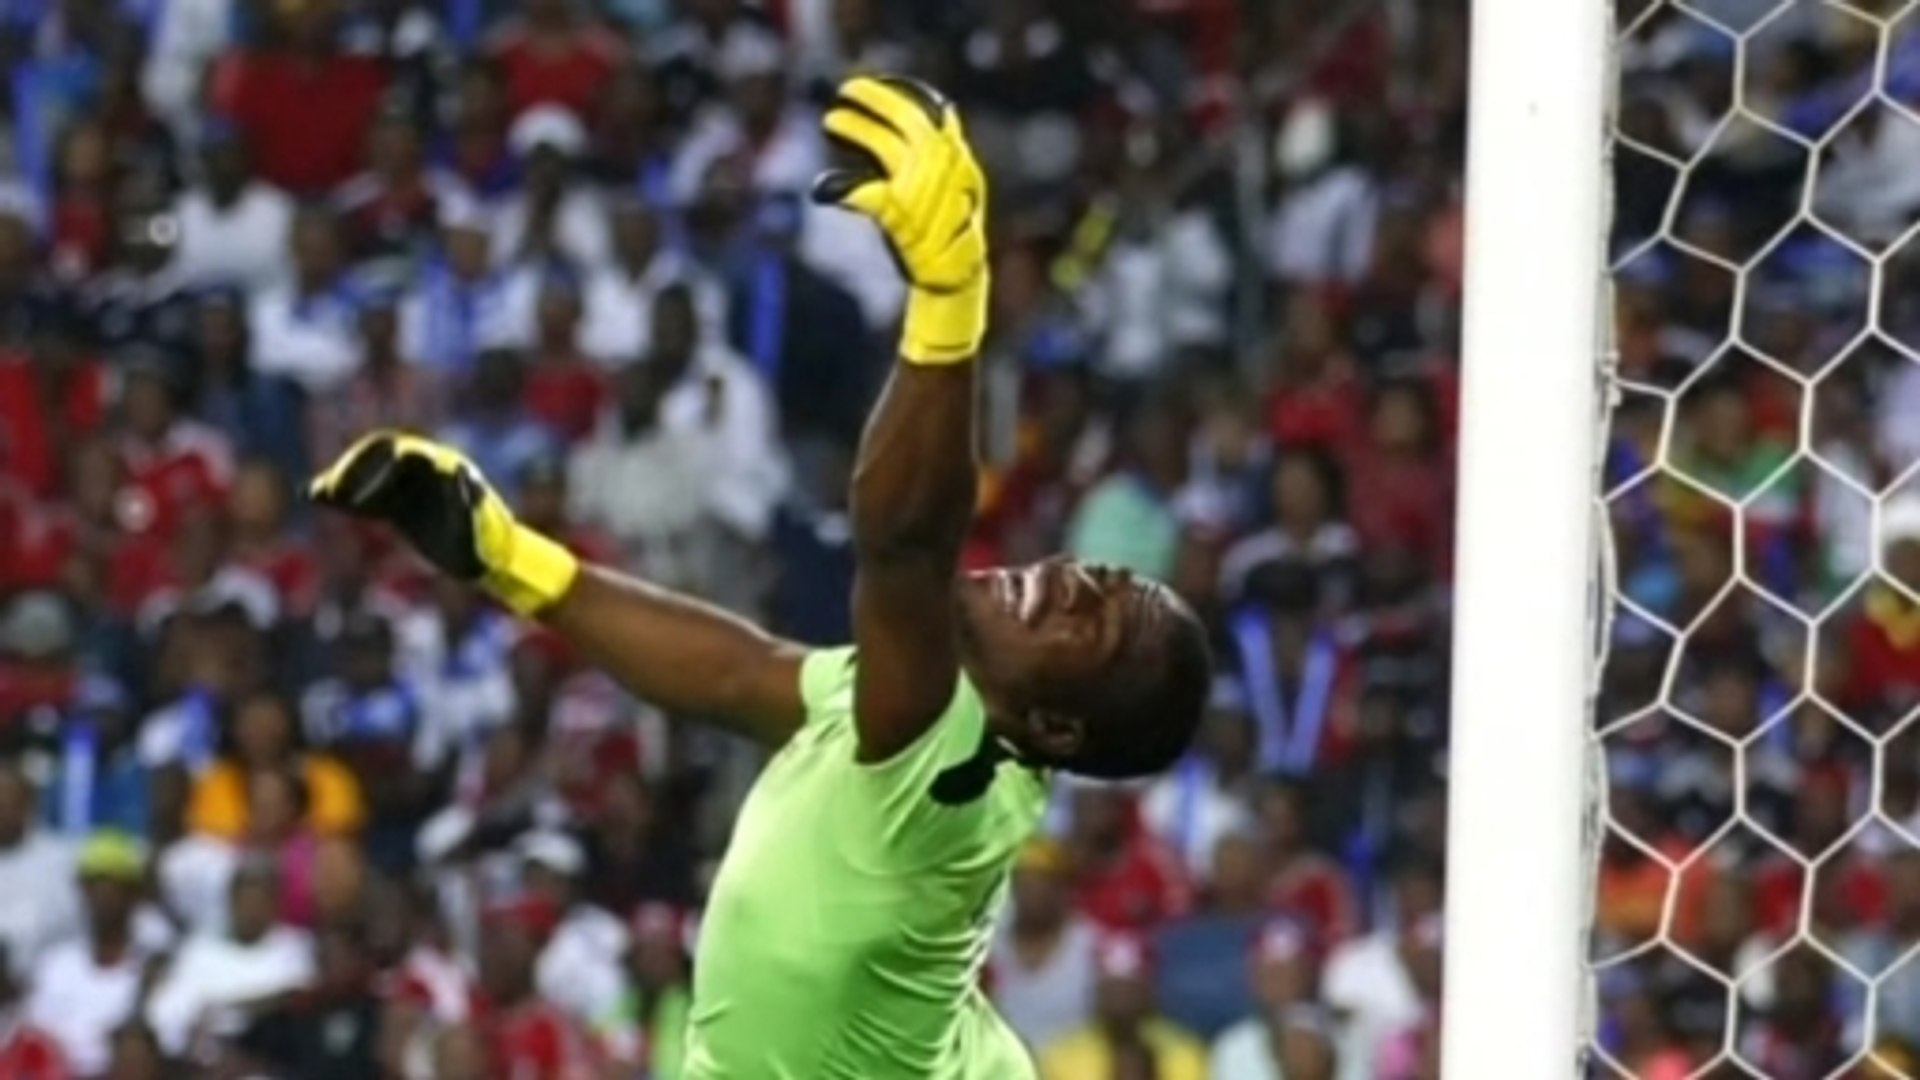 South Africa soccer captain killed